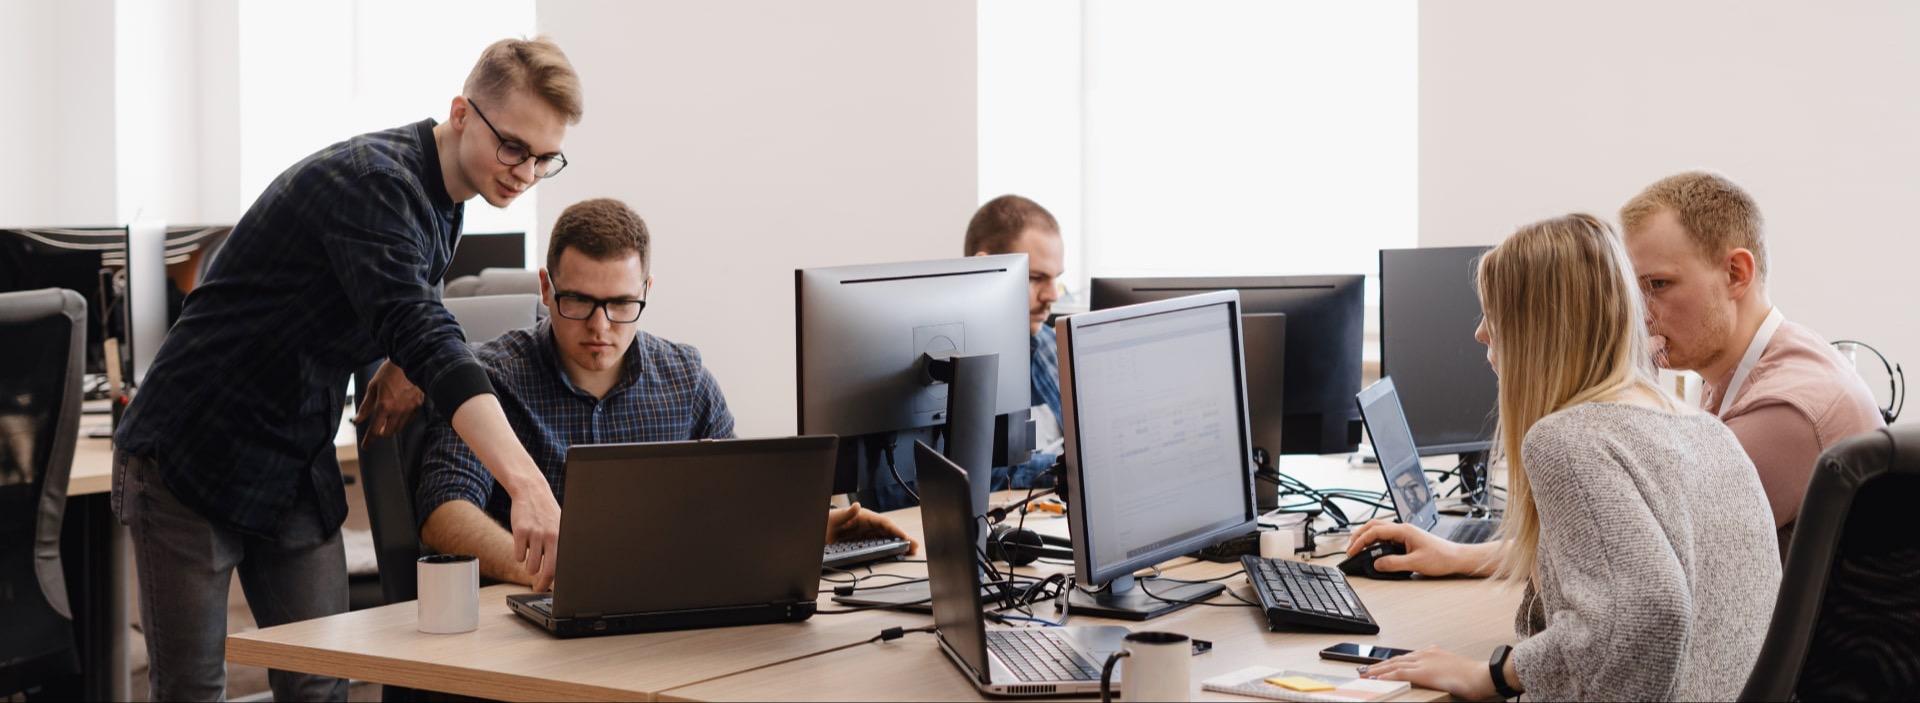 Building a reliable cloud migration team: stats, tips, success stories